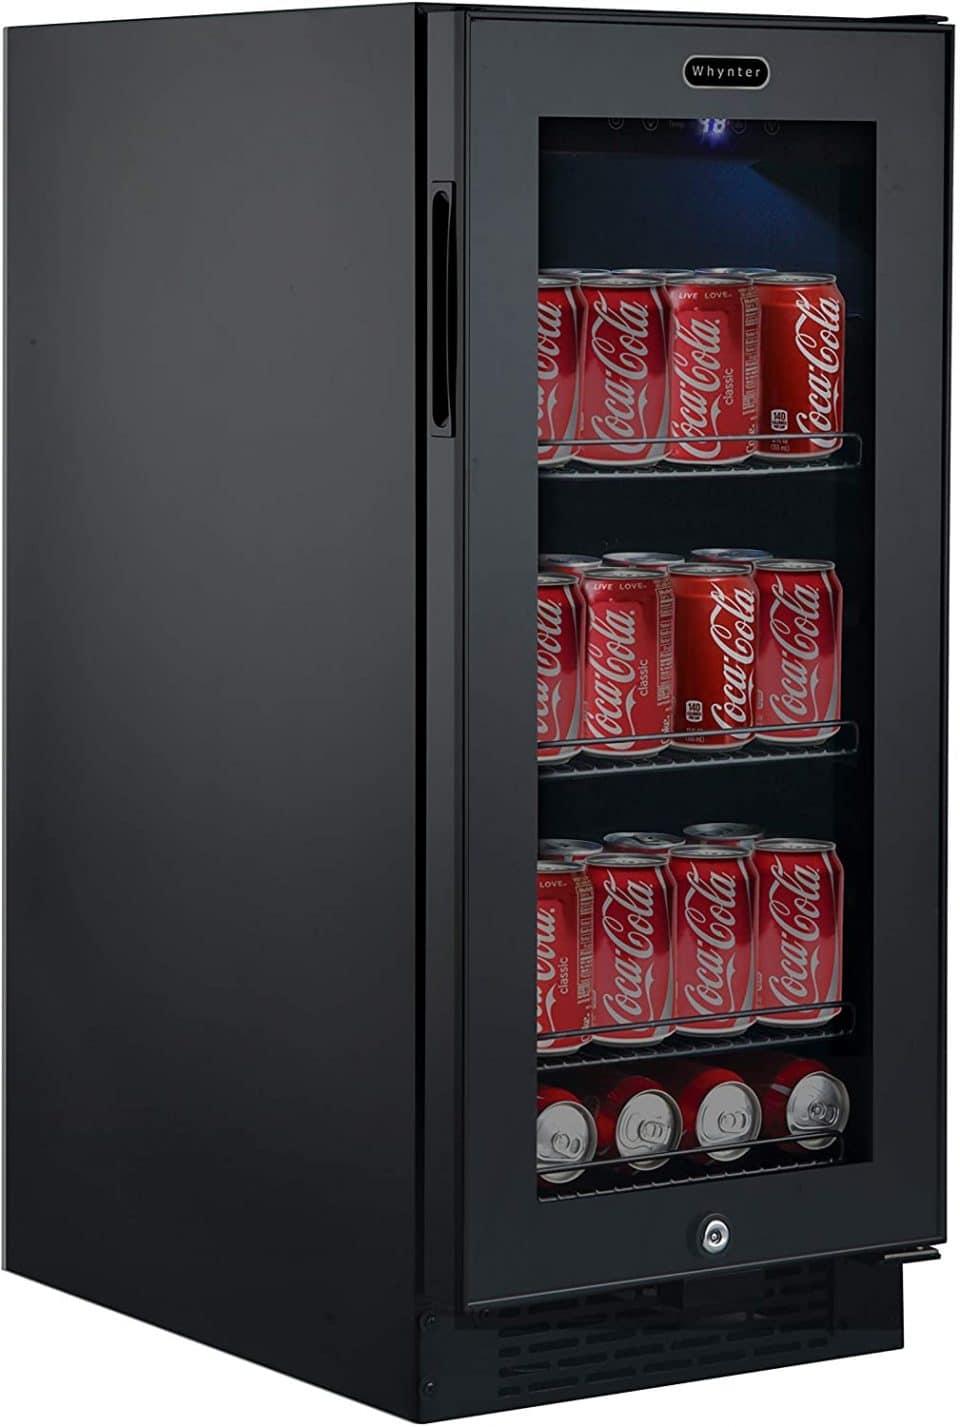 Whynter Built-in Black Glass Beverage Refrigerator